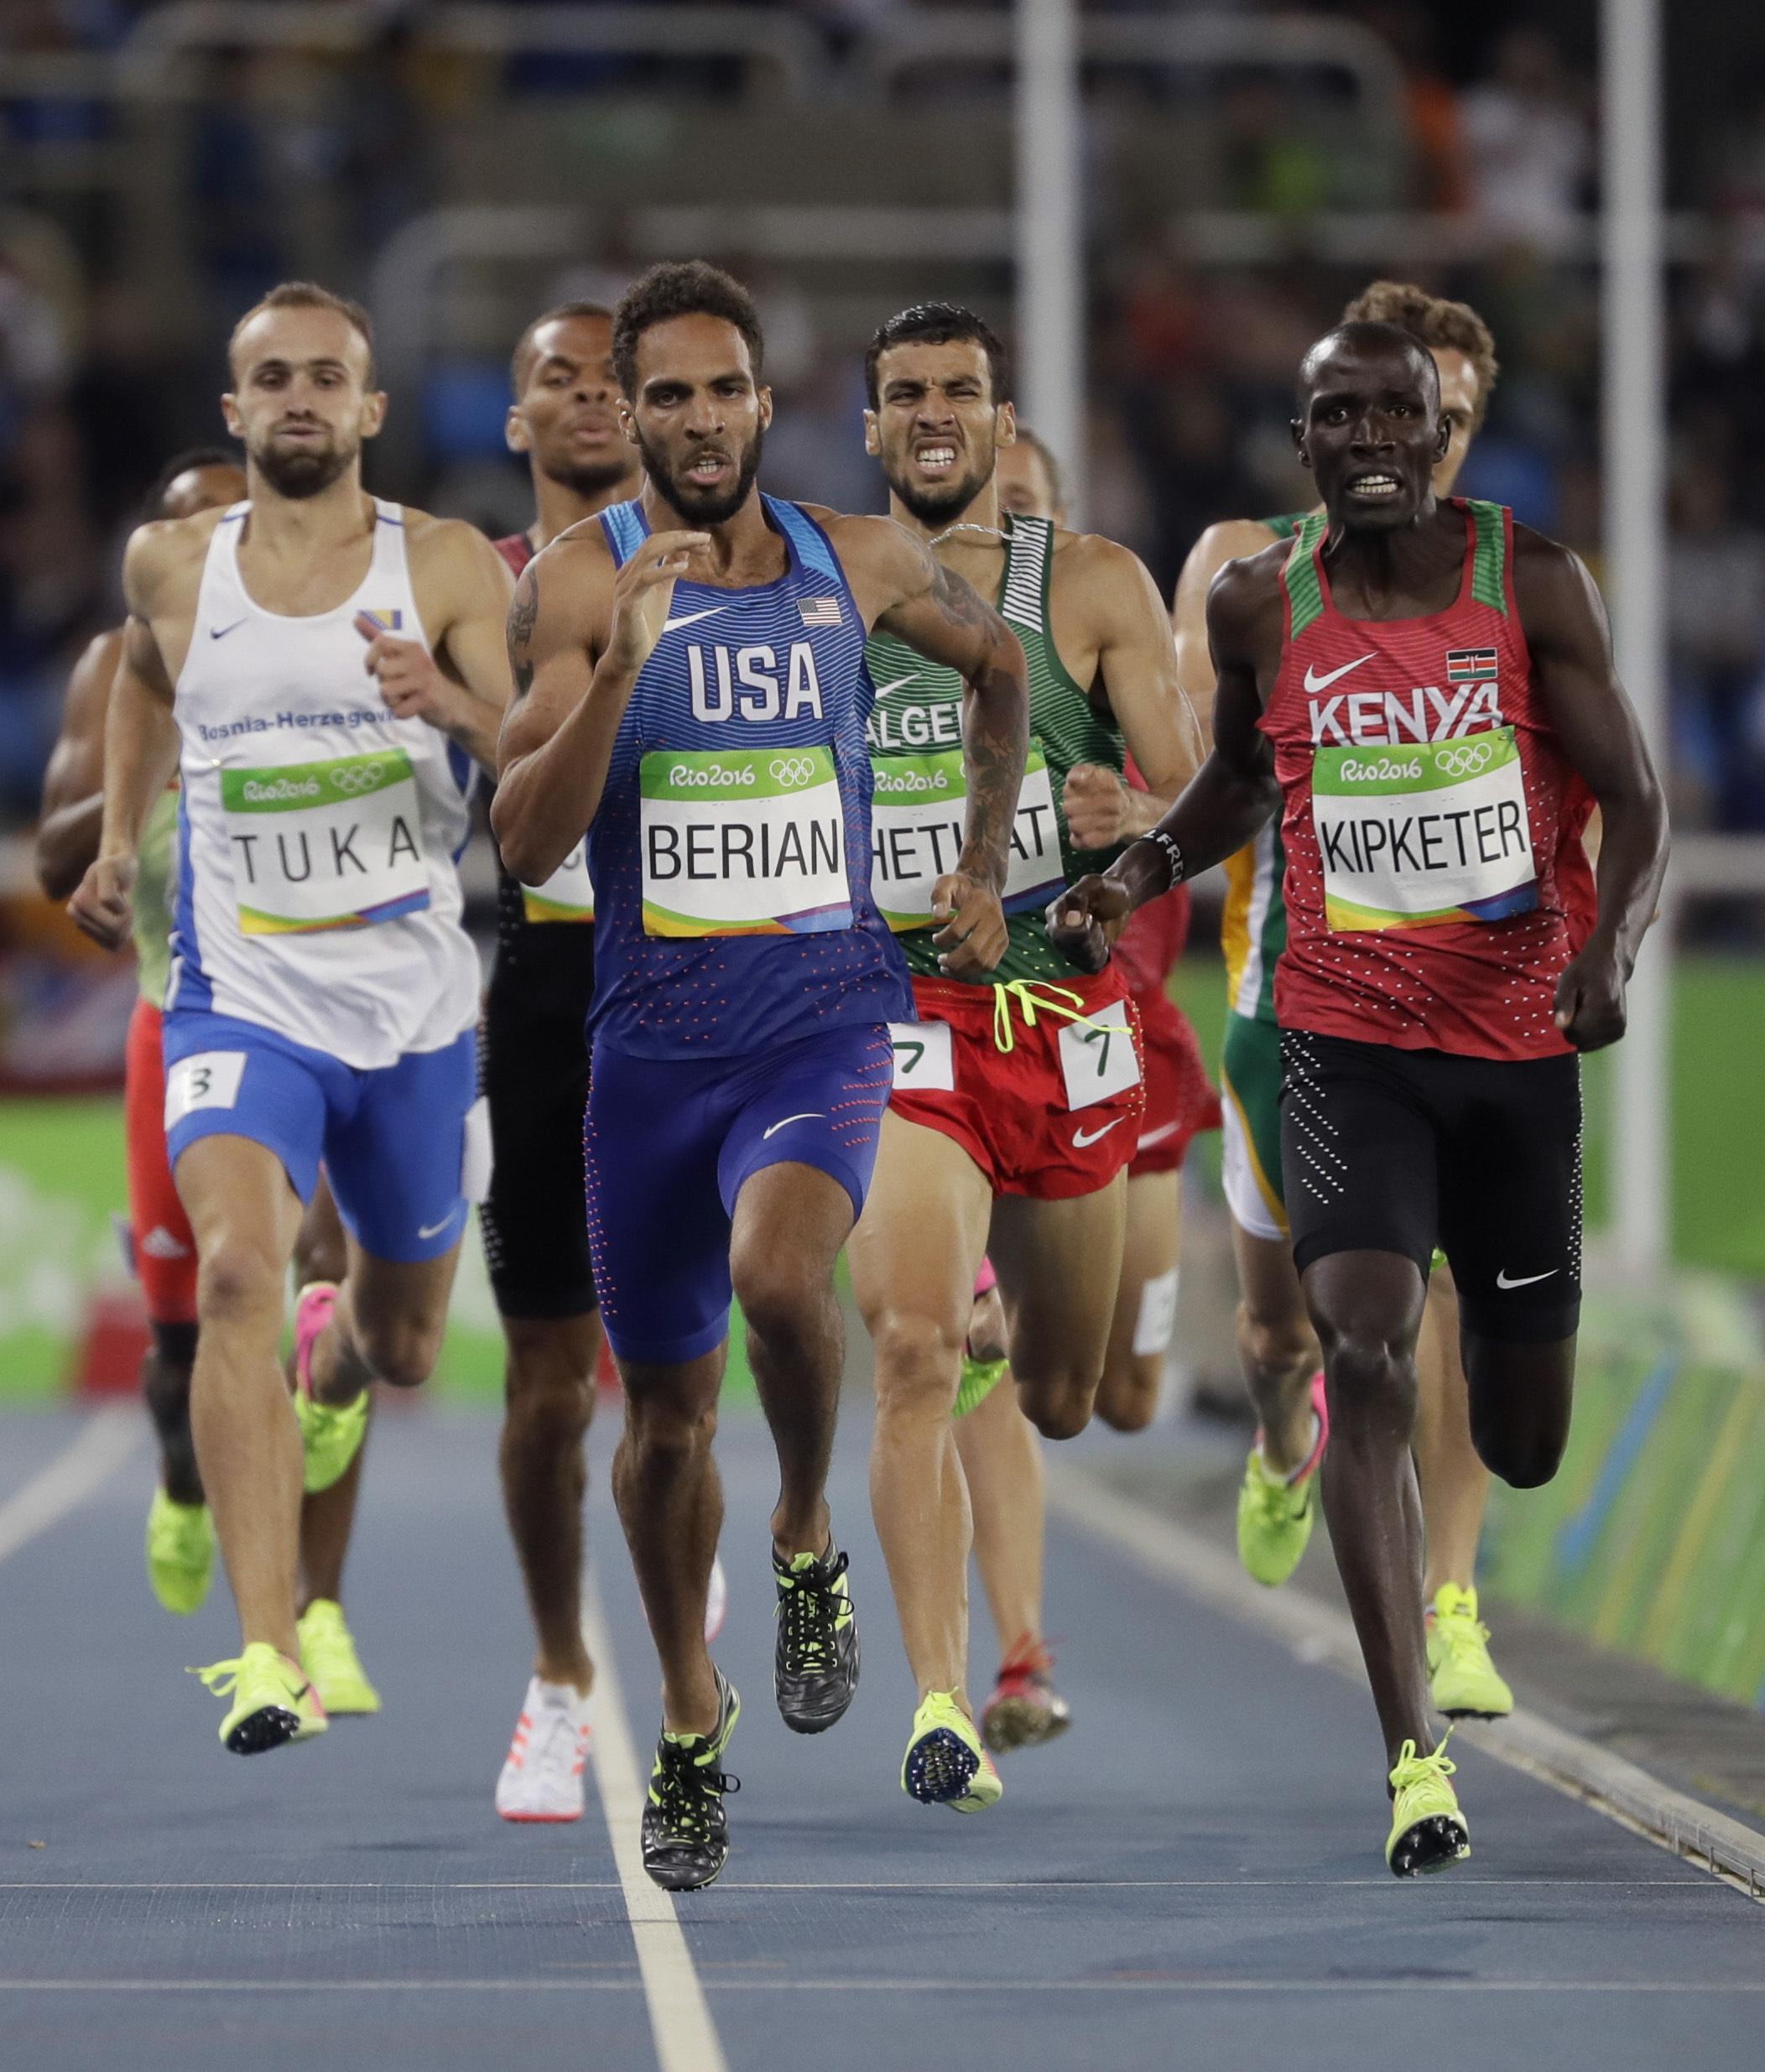 Photo: Coloradan Boris Berian in Men's 800M (AP Photo)